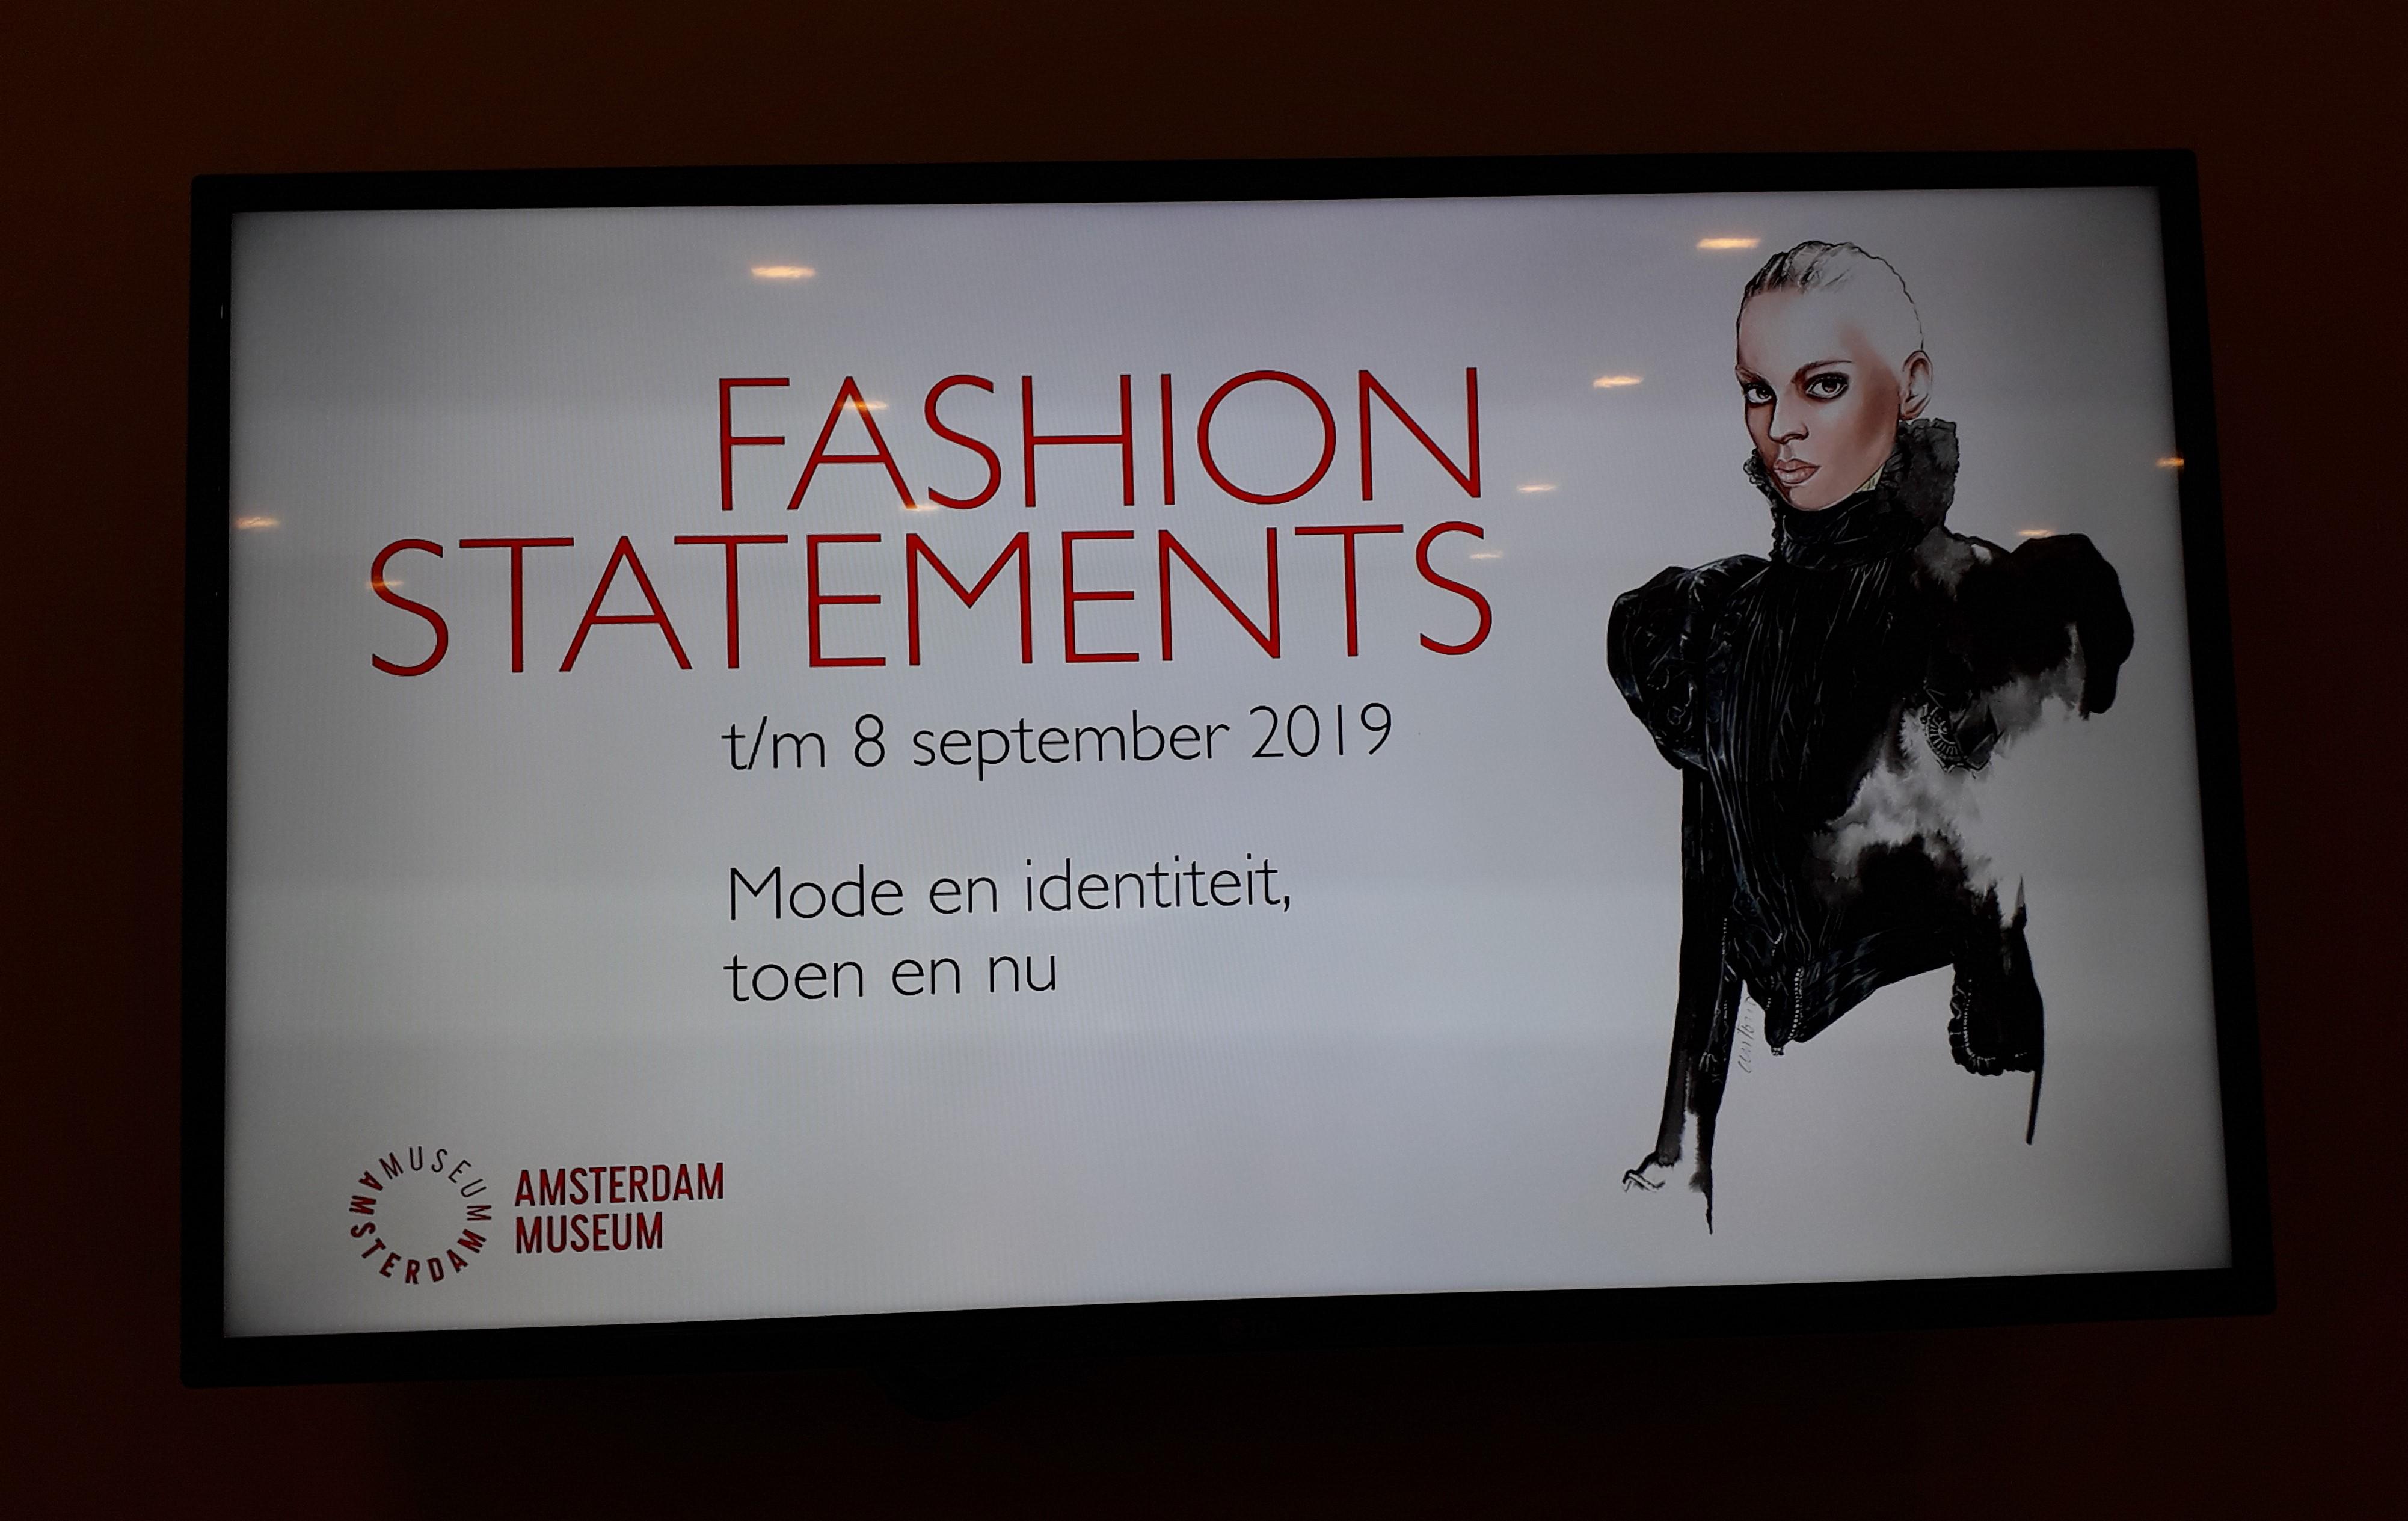 Tentoonstelling Fashion Statements in het Amsterdam Museum